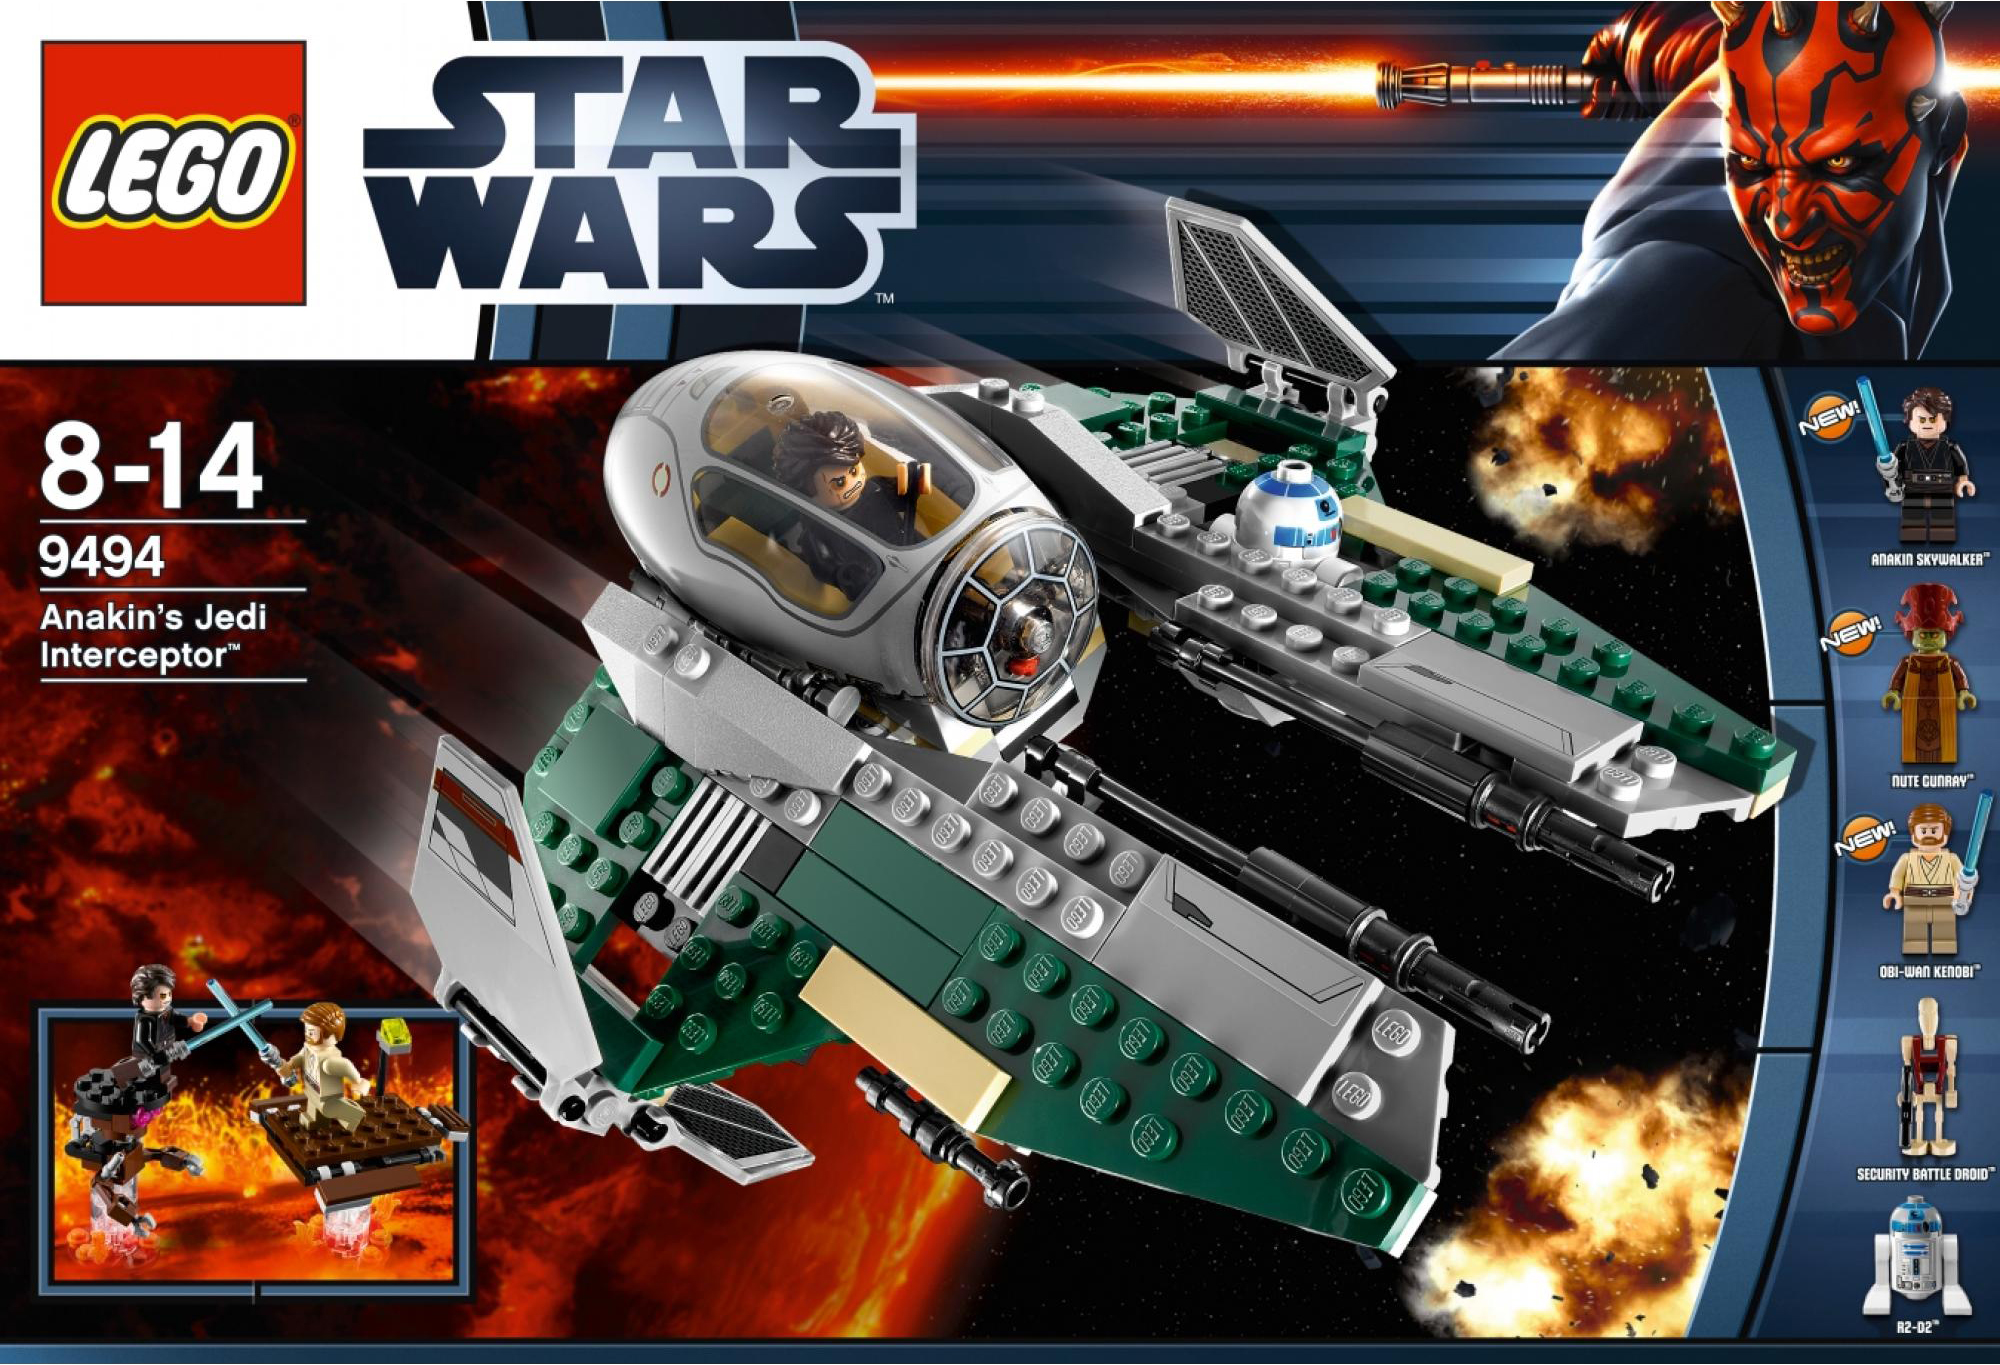 Image 9494 brickipedia fandom powered by wikia - Lego star wars vaisseau anakin ...